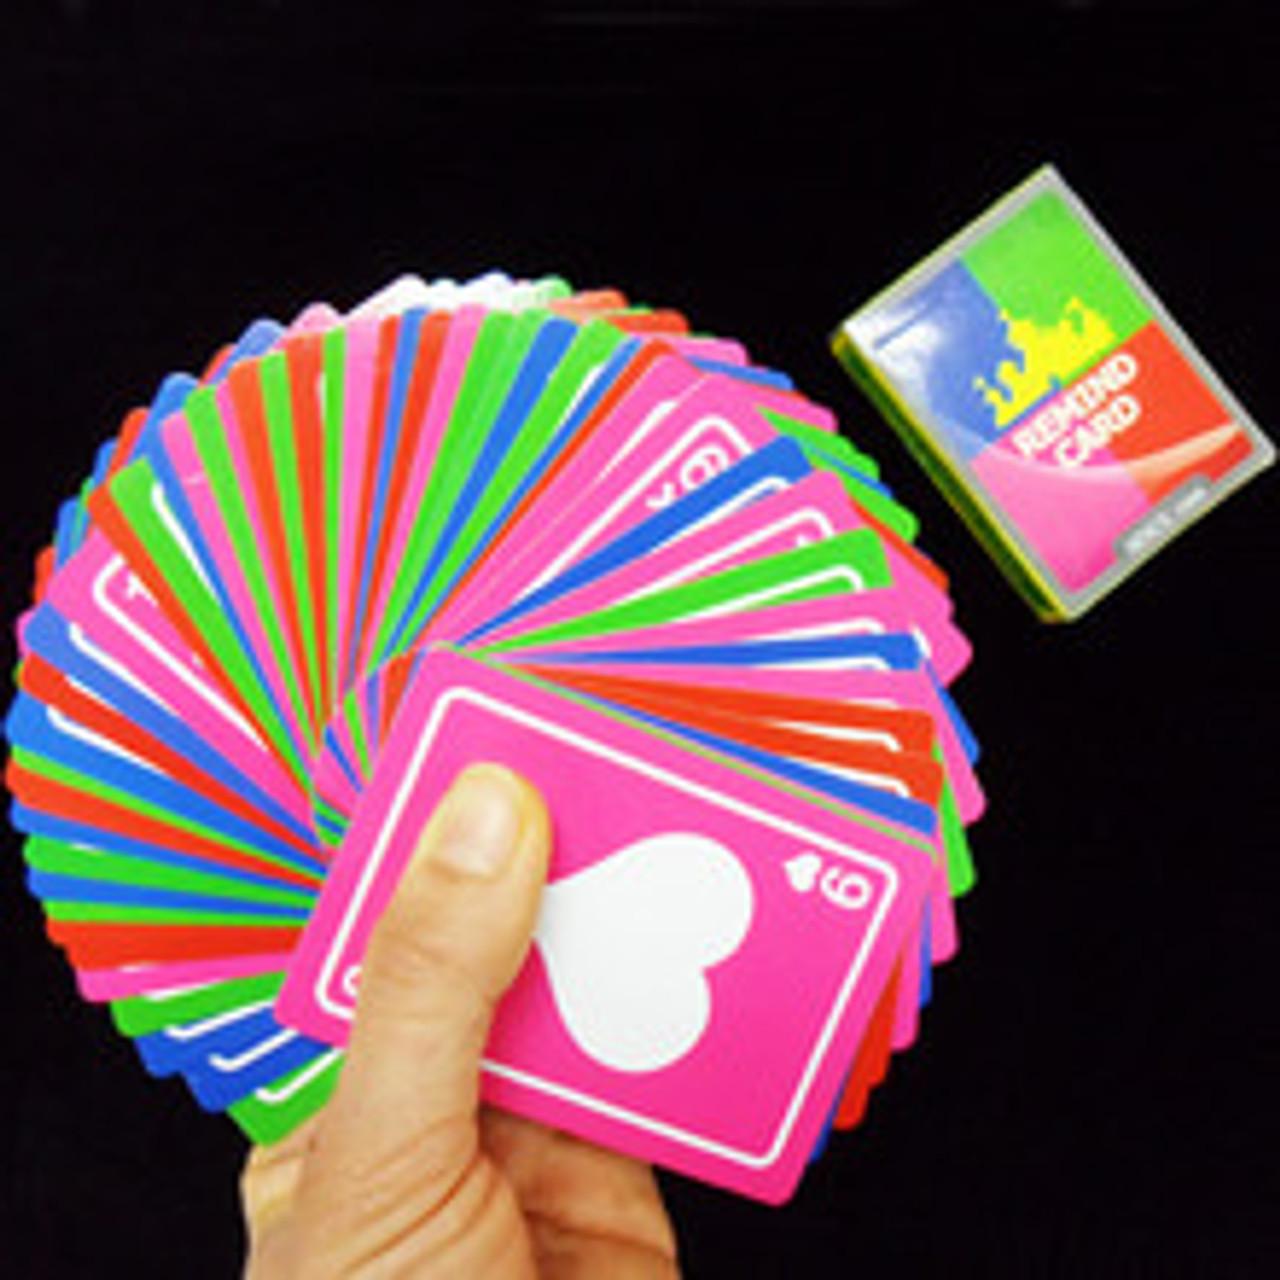 Icon Deck - Symbolic playing Cards - JL Magic Tricks Gospel